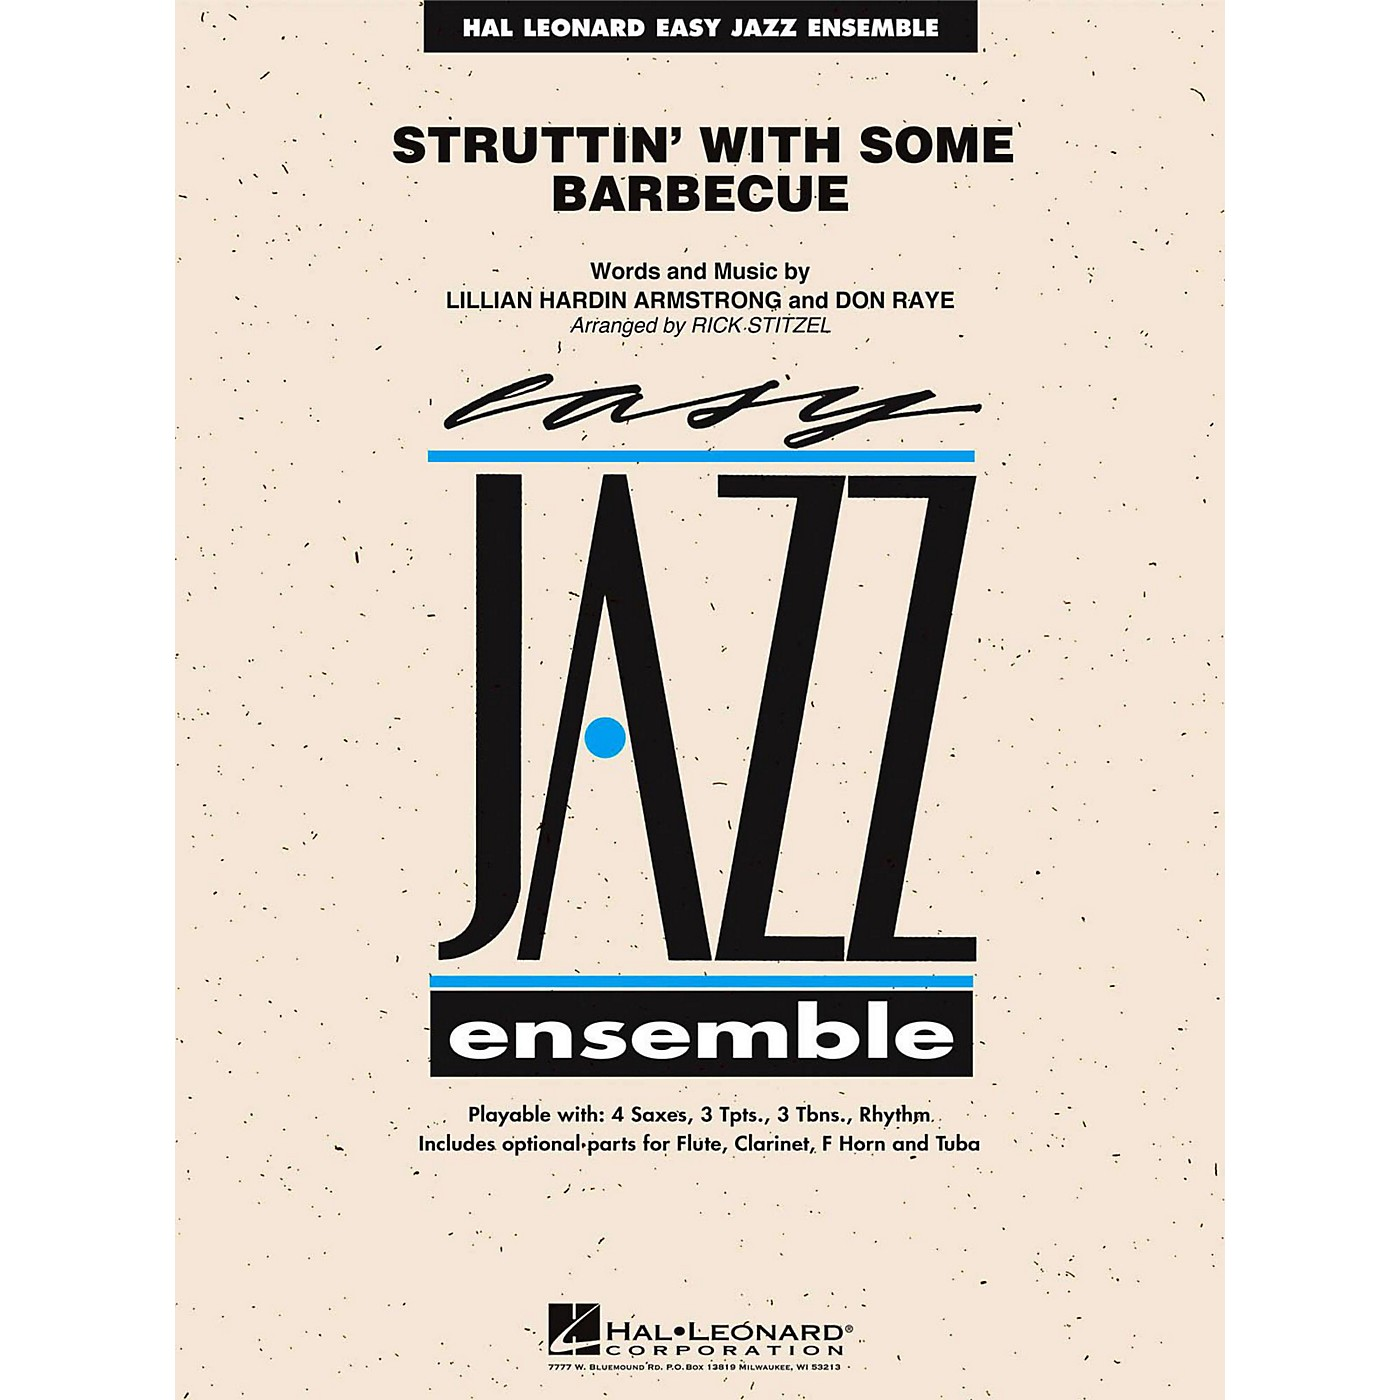 Hal Leonard Struttin' With Some Barbecue Jazz Band Level 2 thumbnail